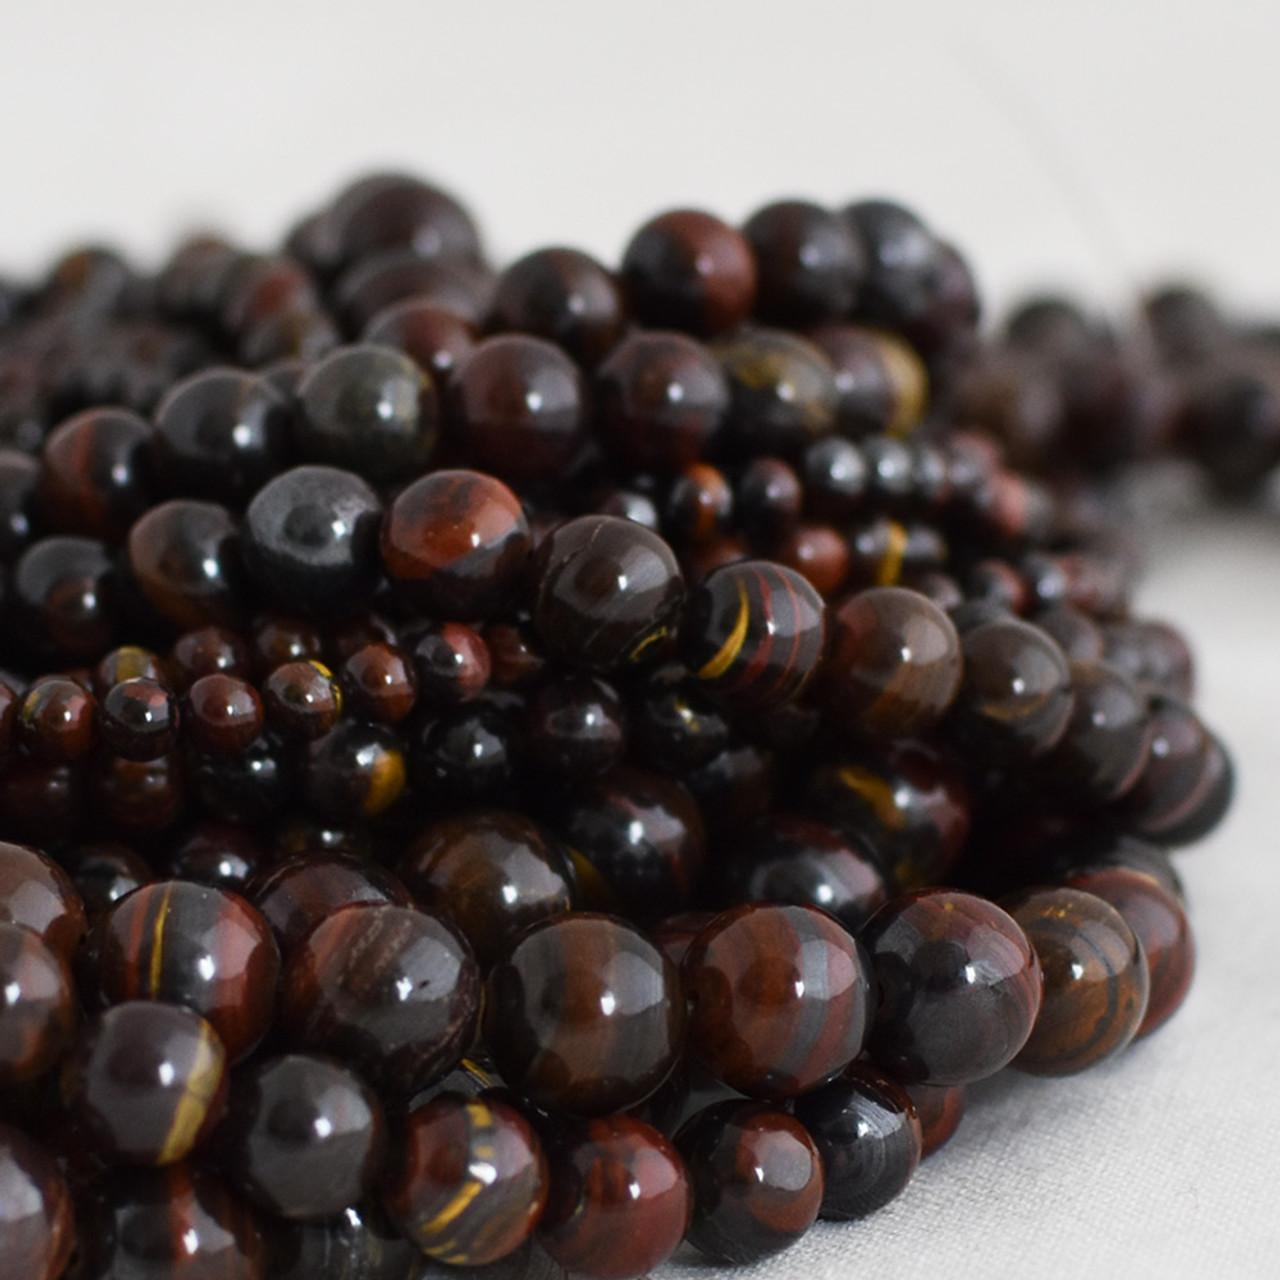 Grade A Natural Blue Tiger Eye Gemstone Round Beads 4mm 6mm 8mm 10mm